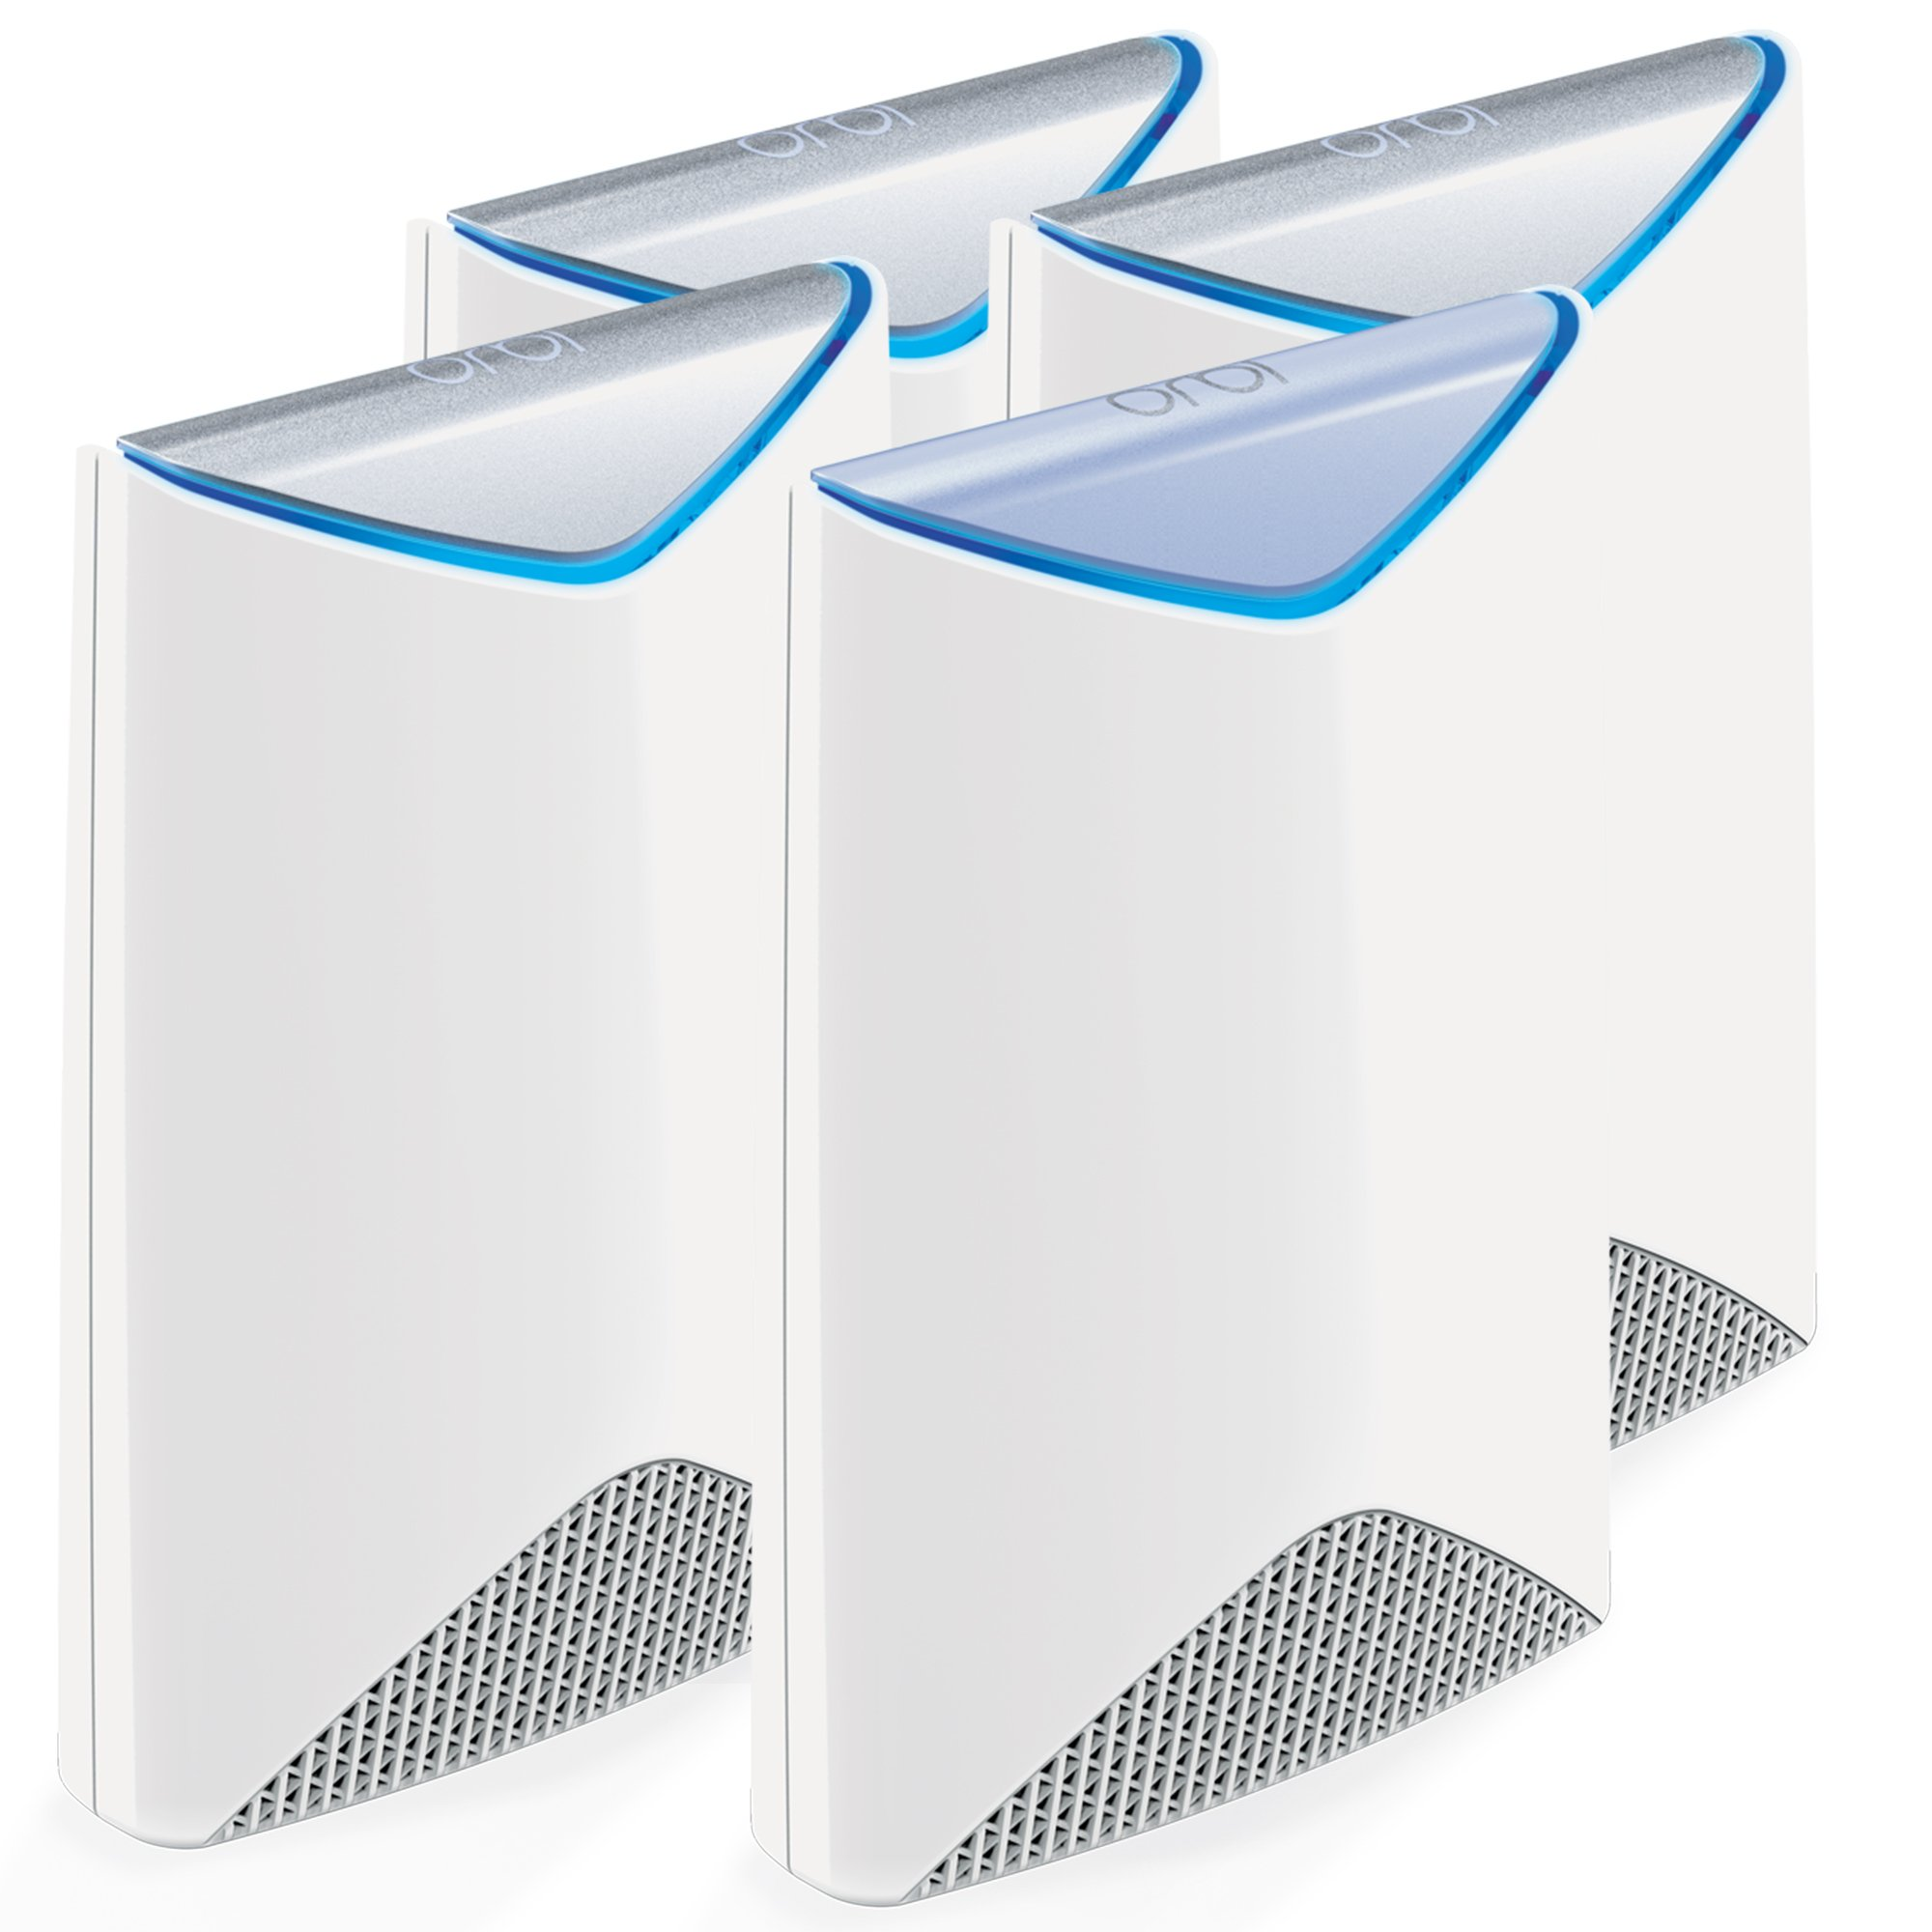 NETGEAR Orbi Pro AC3000 Business Mesh WiFi System, 4-Pack, Wireless Access Point (SRK60B04) by NETGEAR